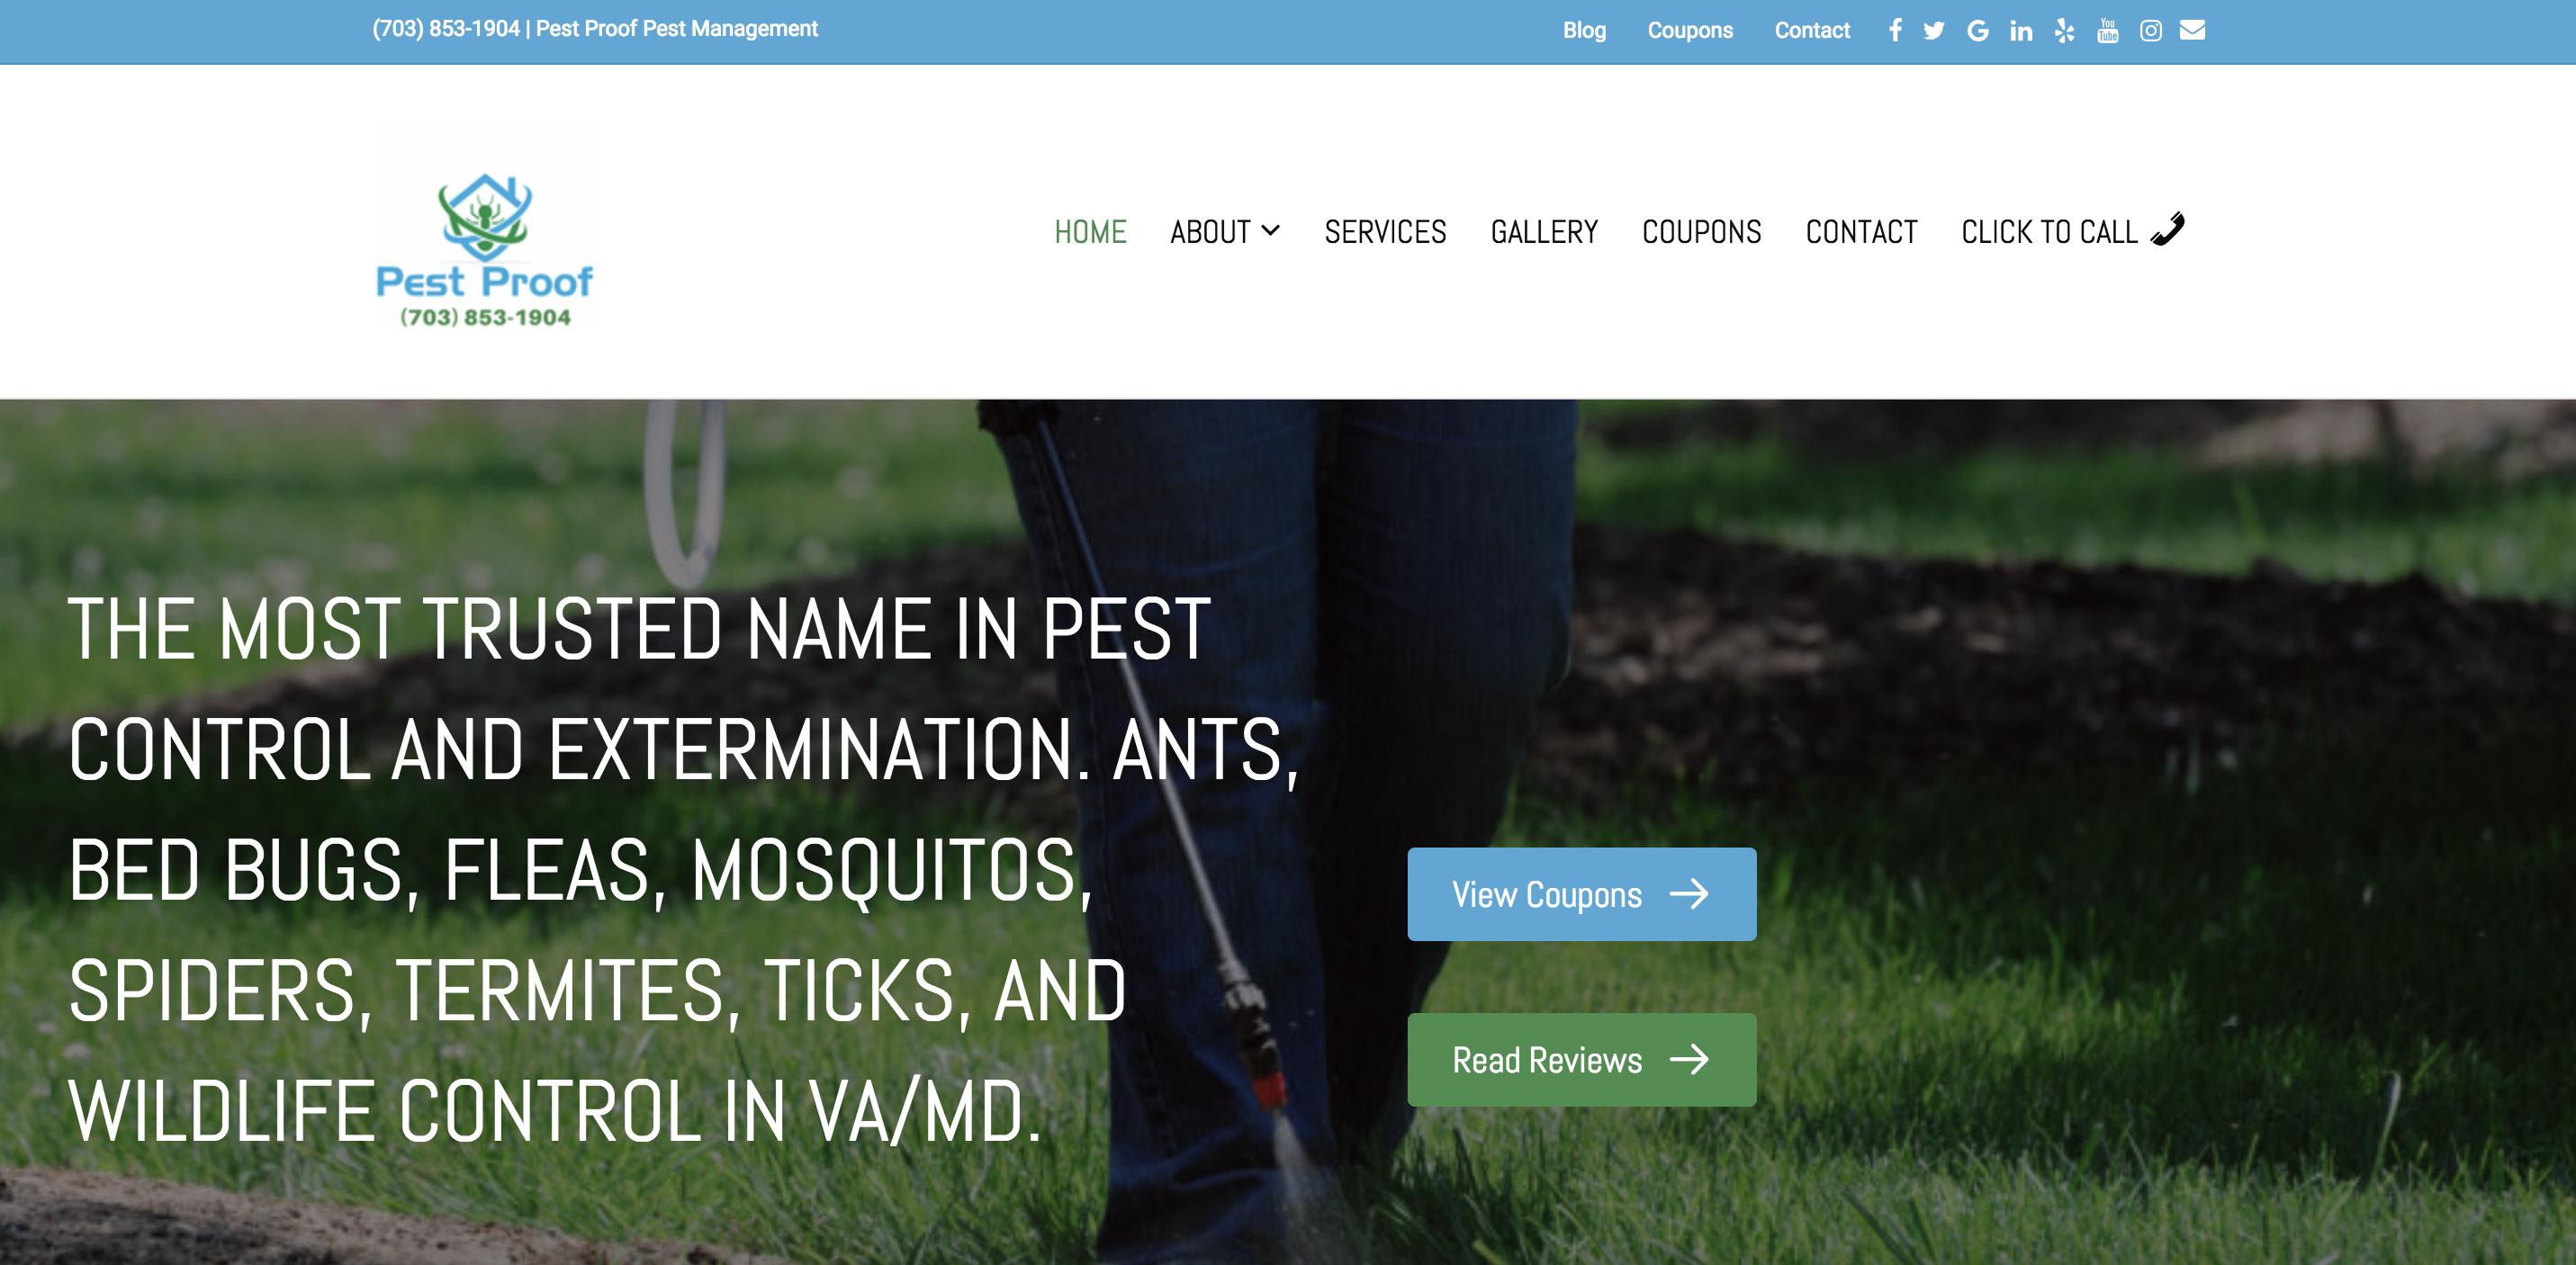 Our Work - Pest Proof Pest Management